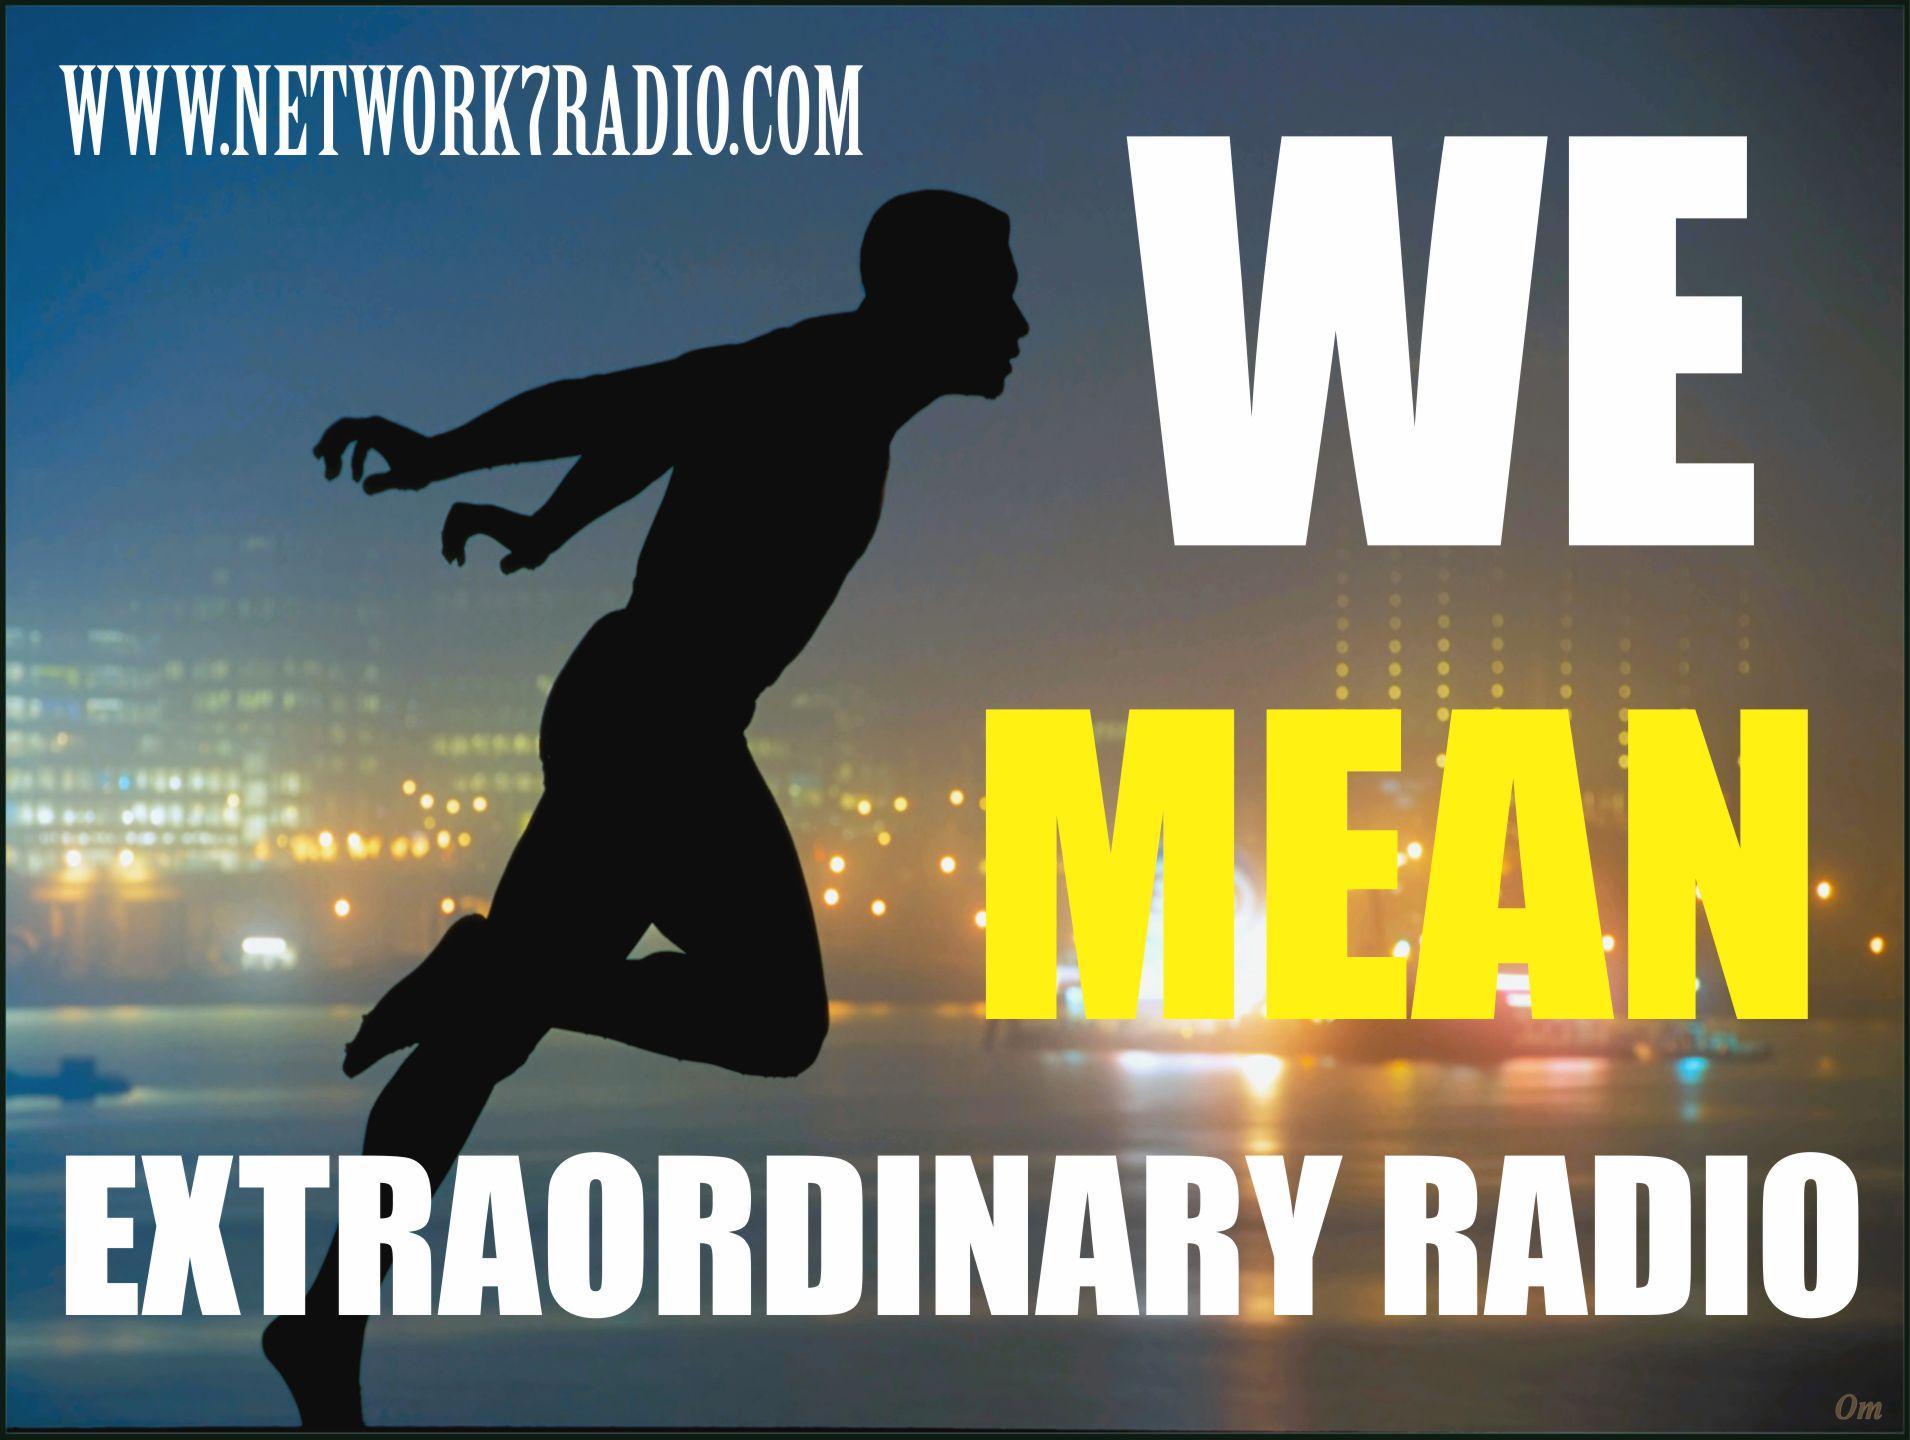 Network 7 Radio